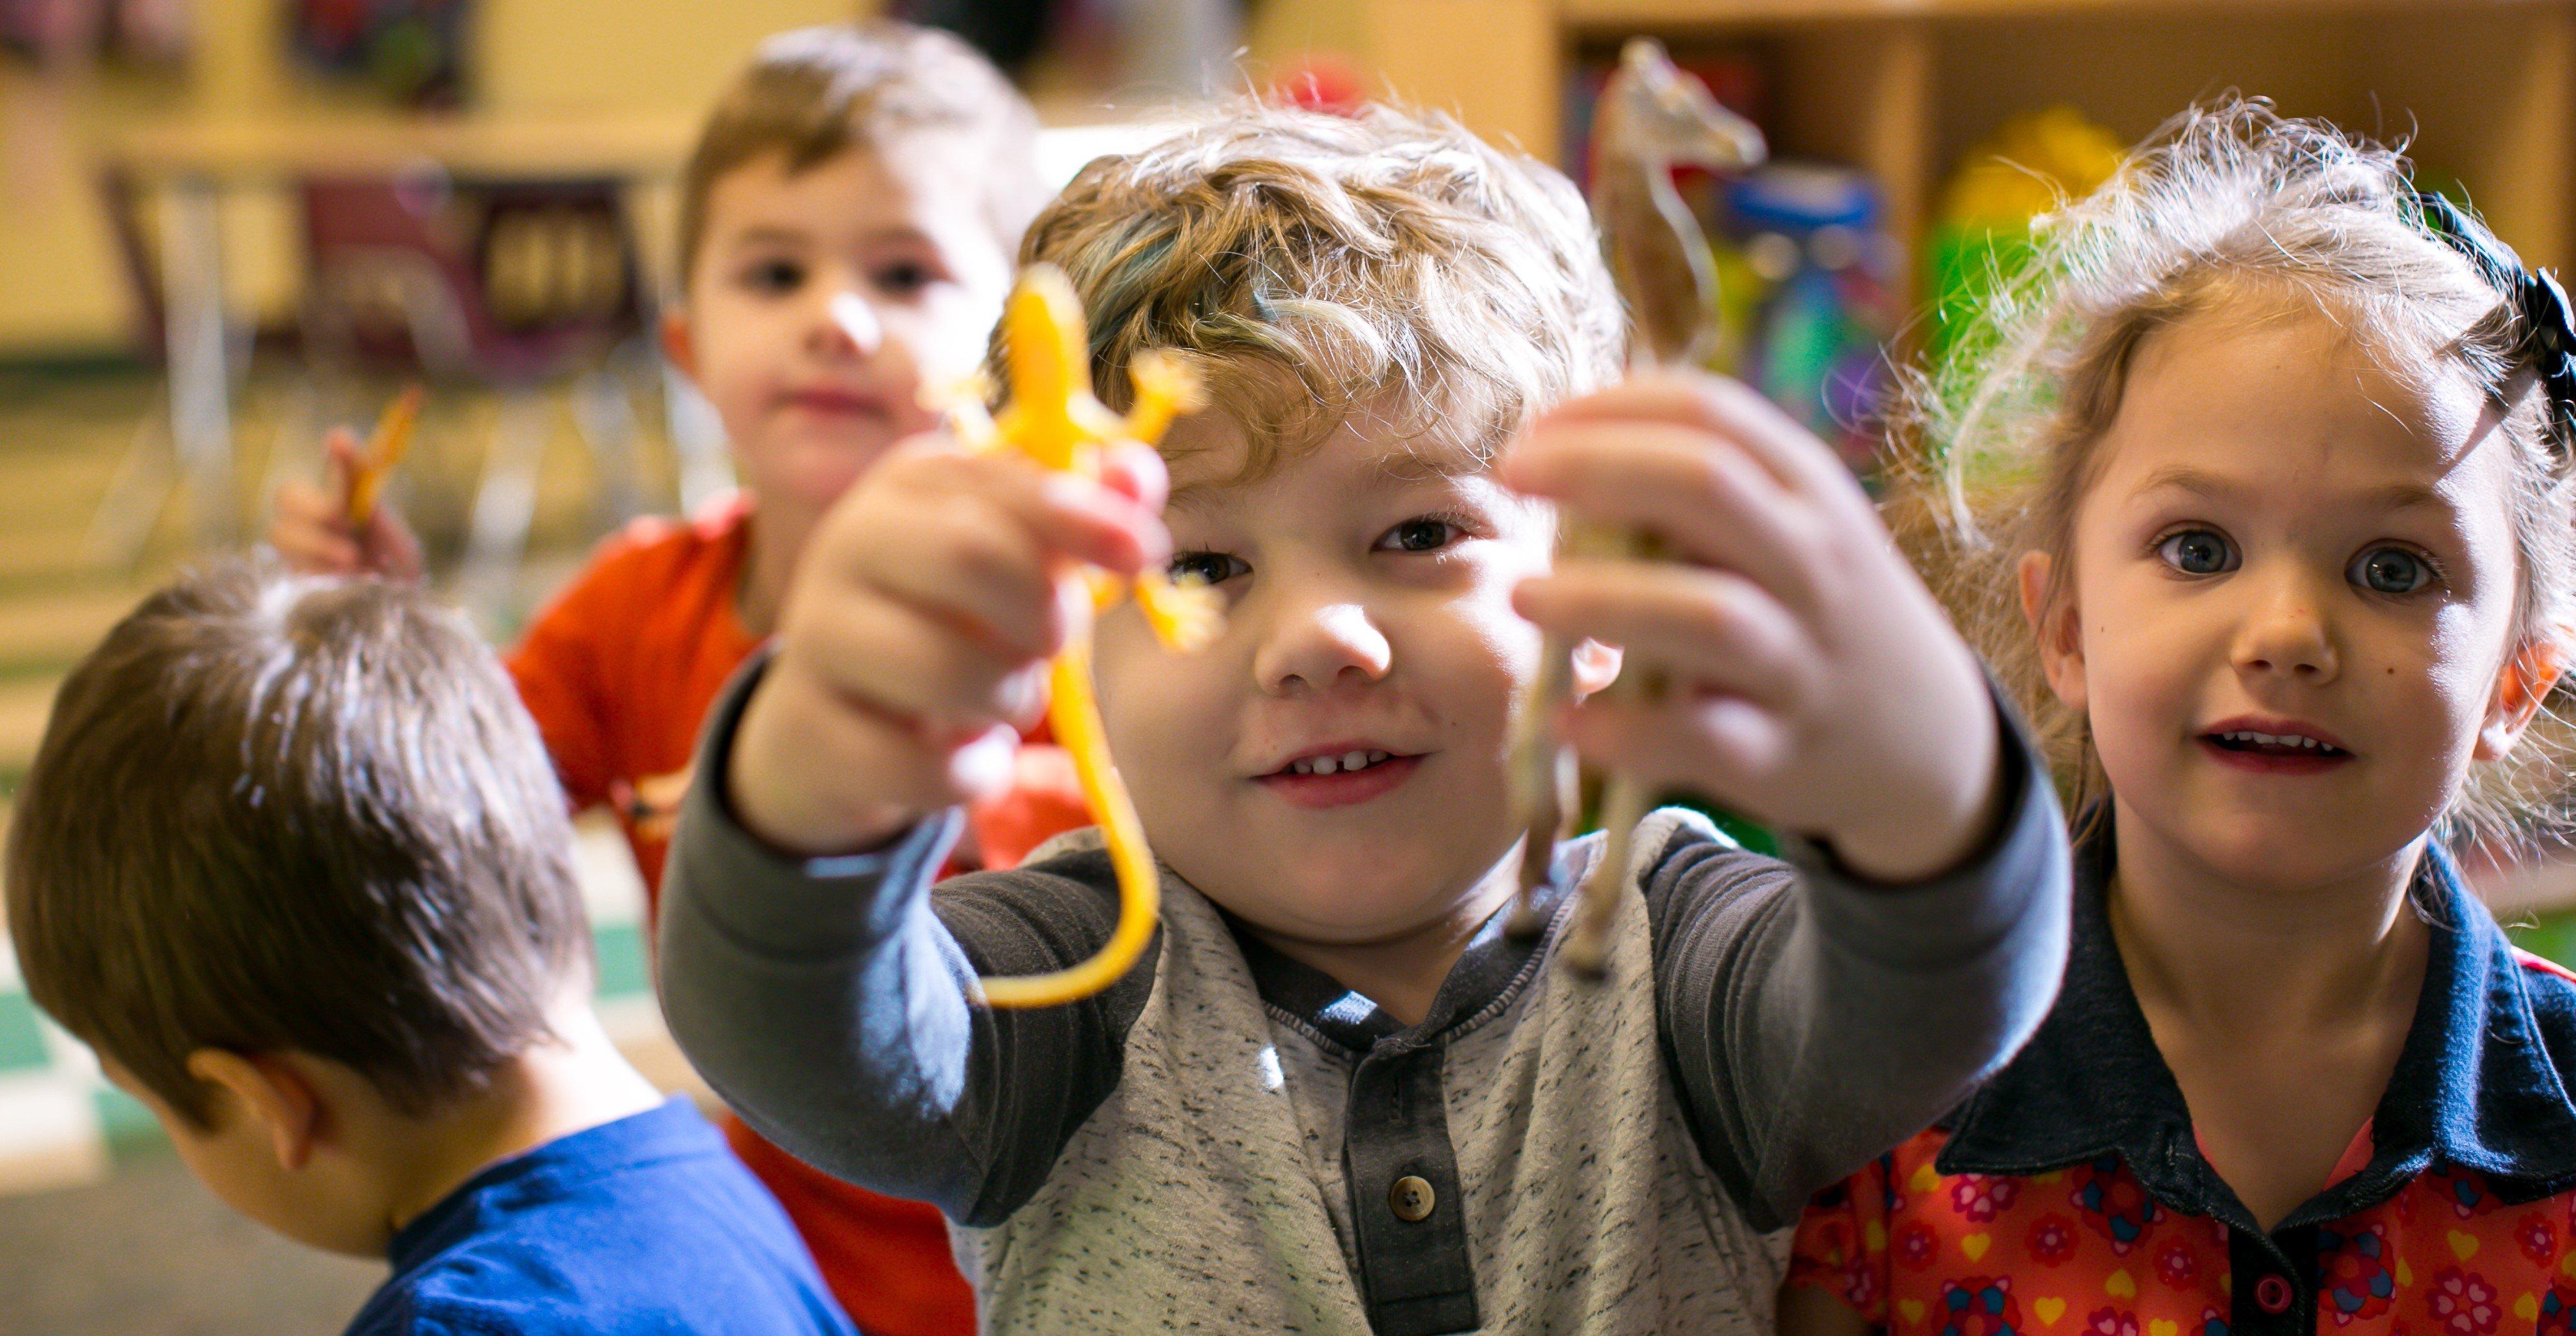 veritas preschool | Veritas Academy | Classical Christian School